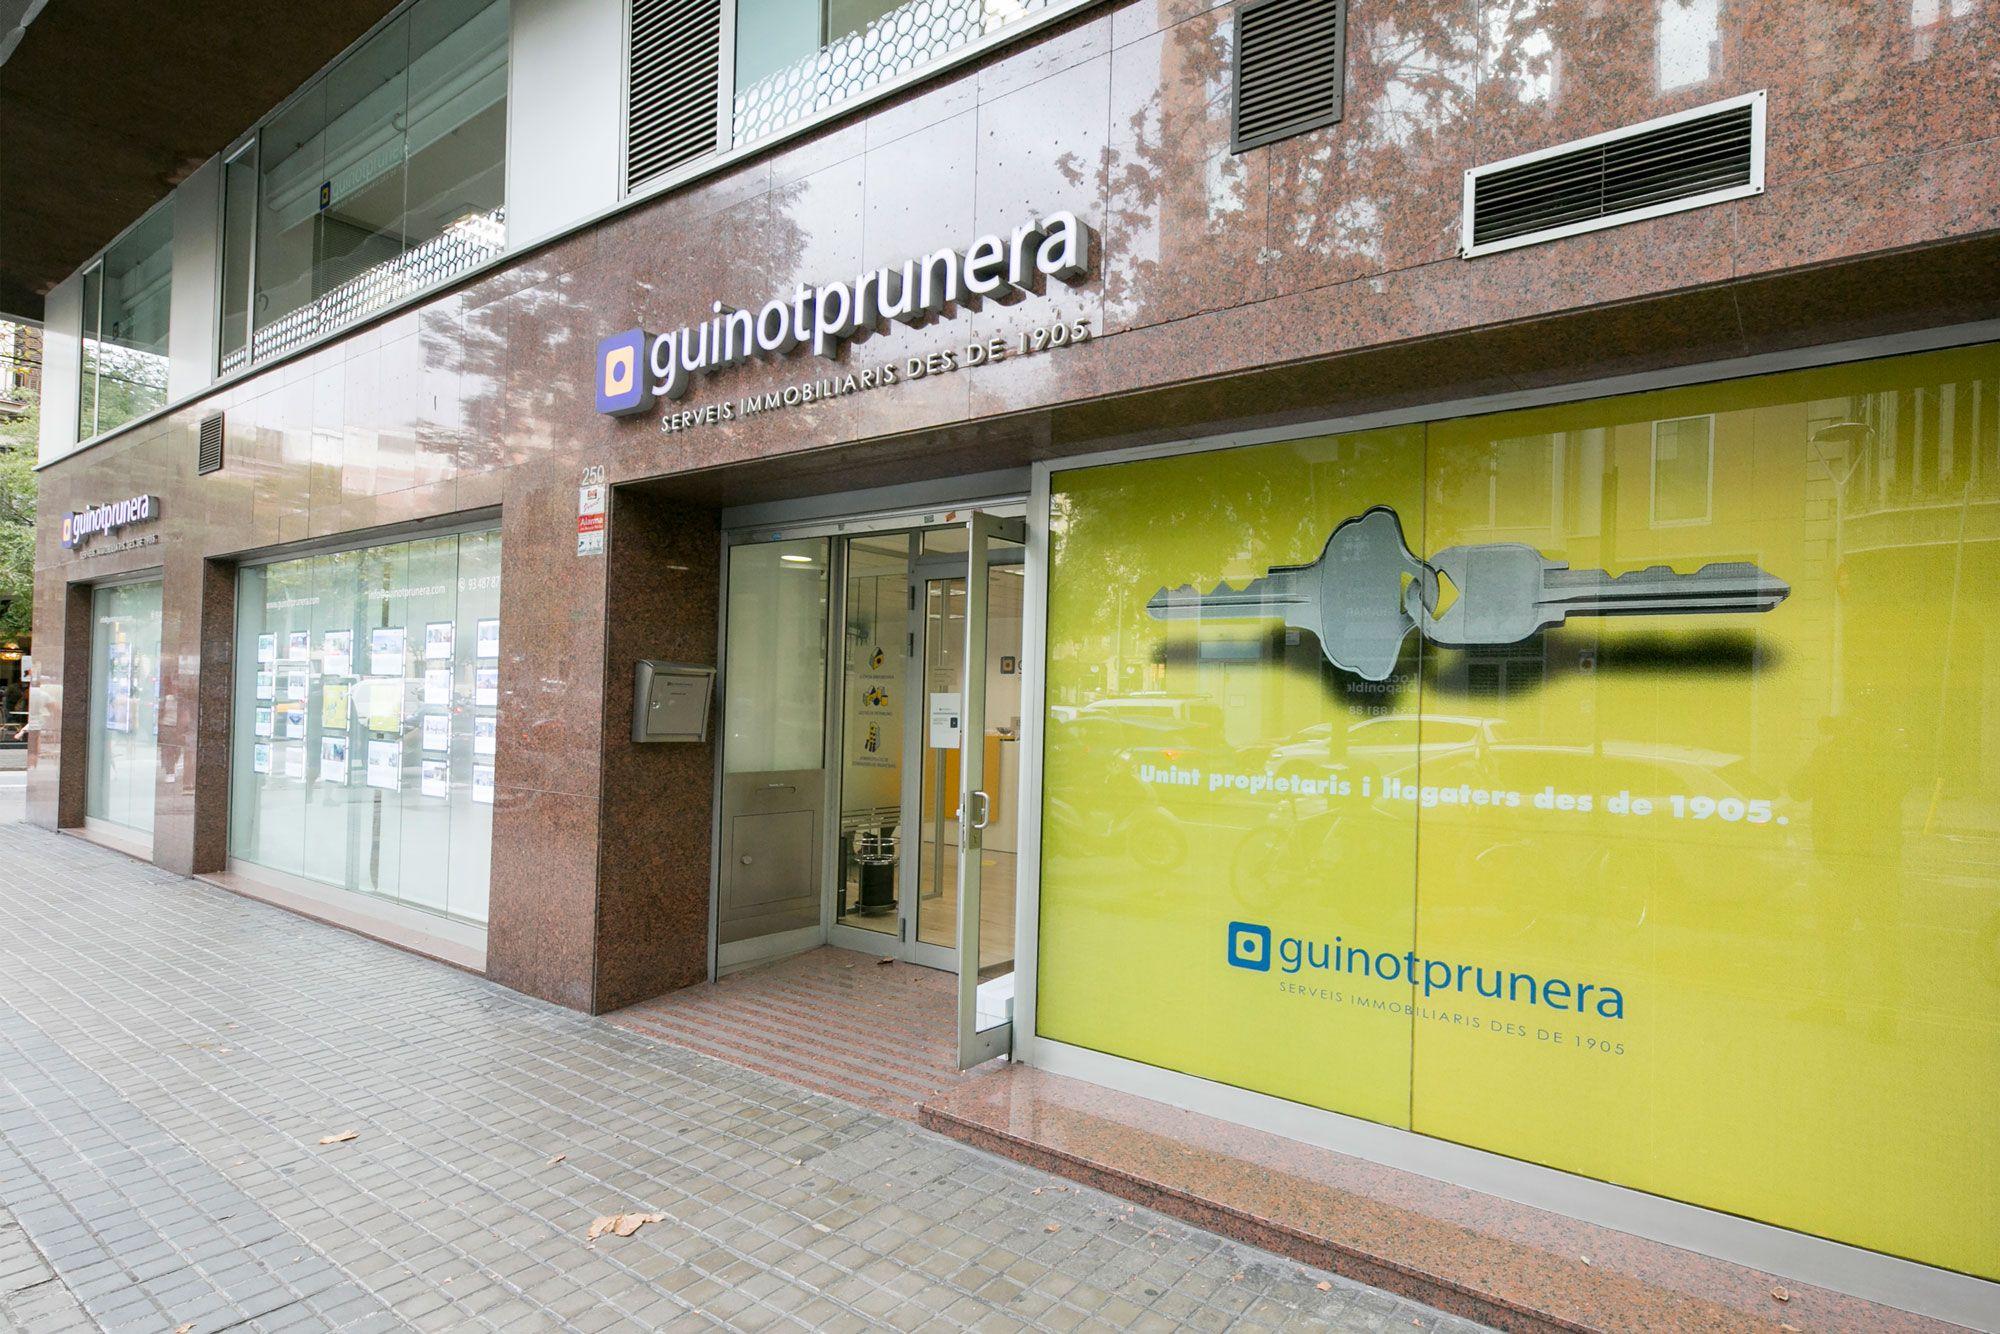 Foto de Oficina GuinotPrunera - Rosselló